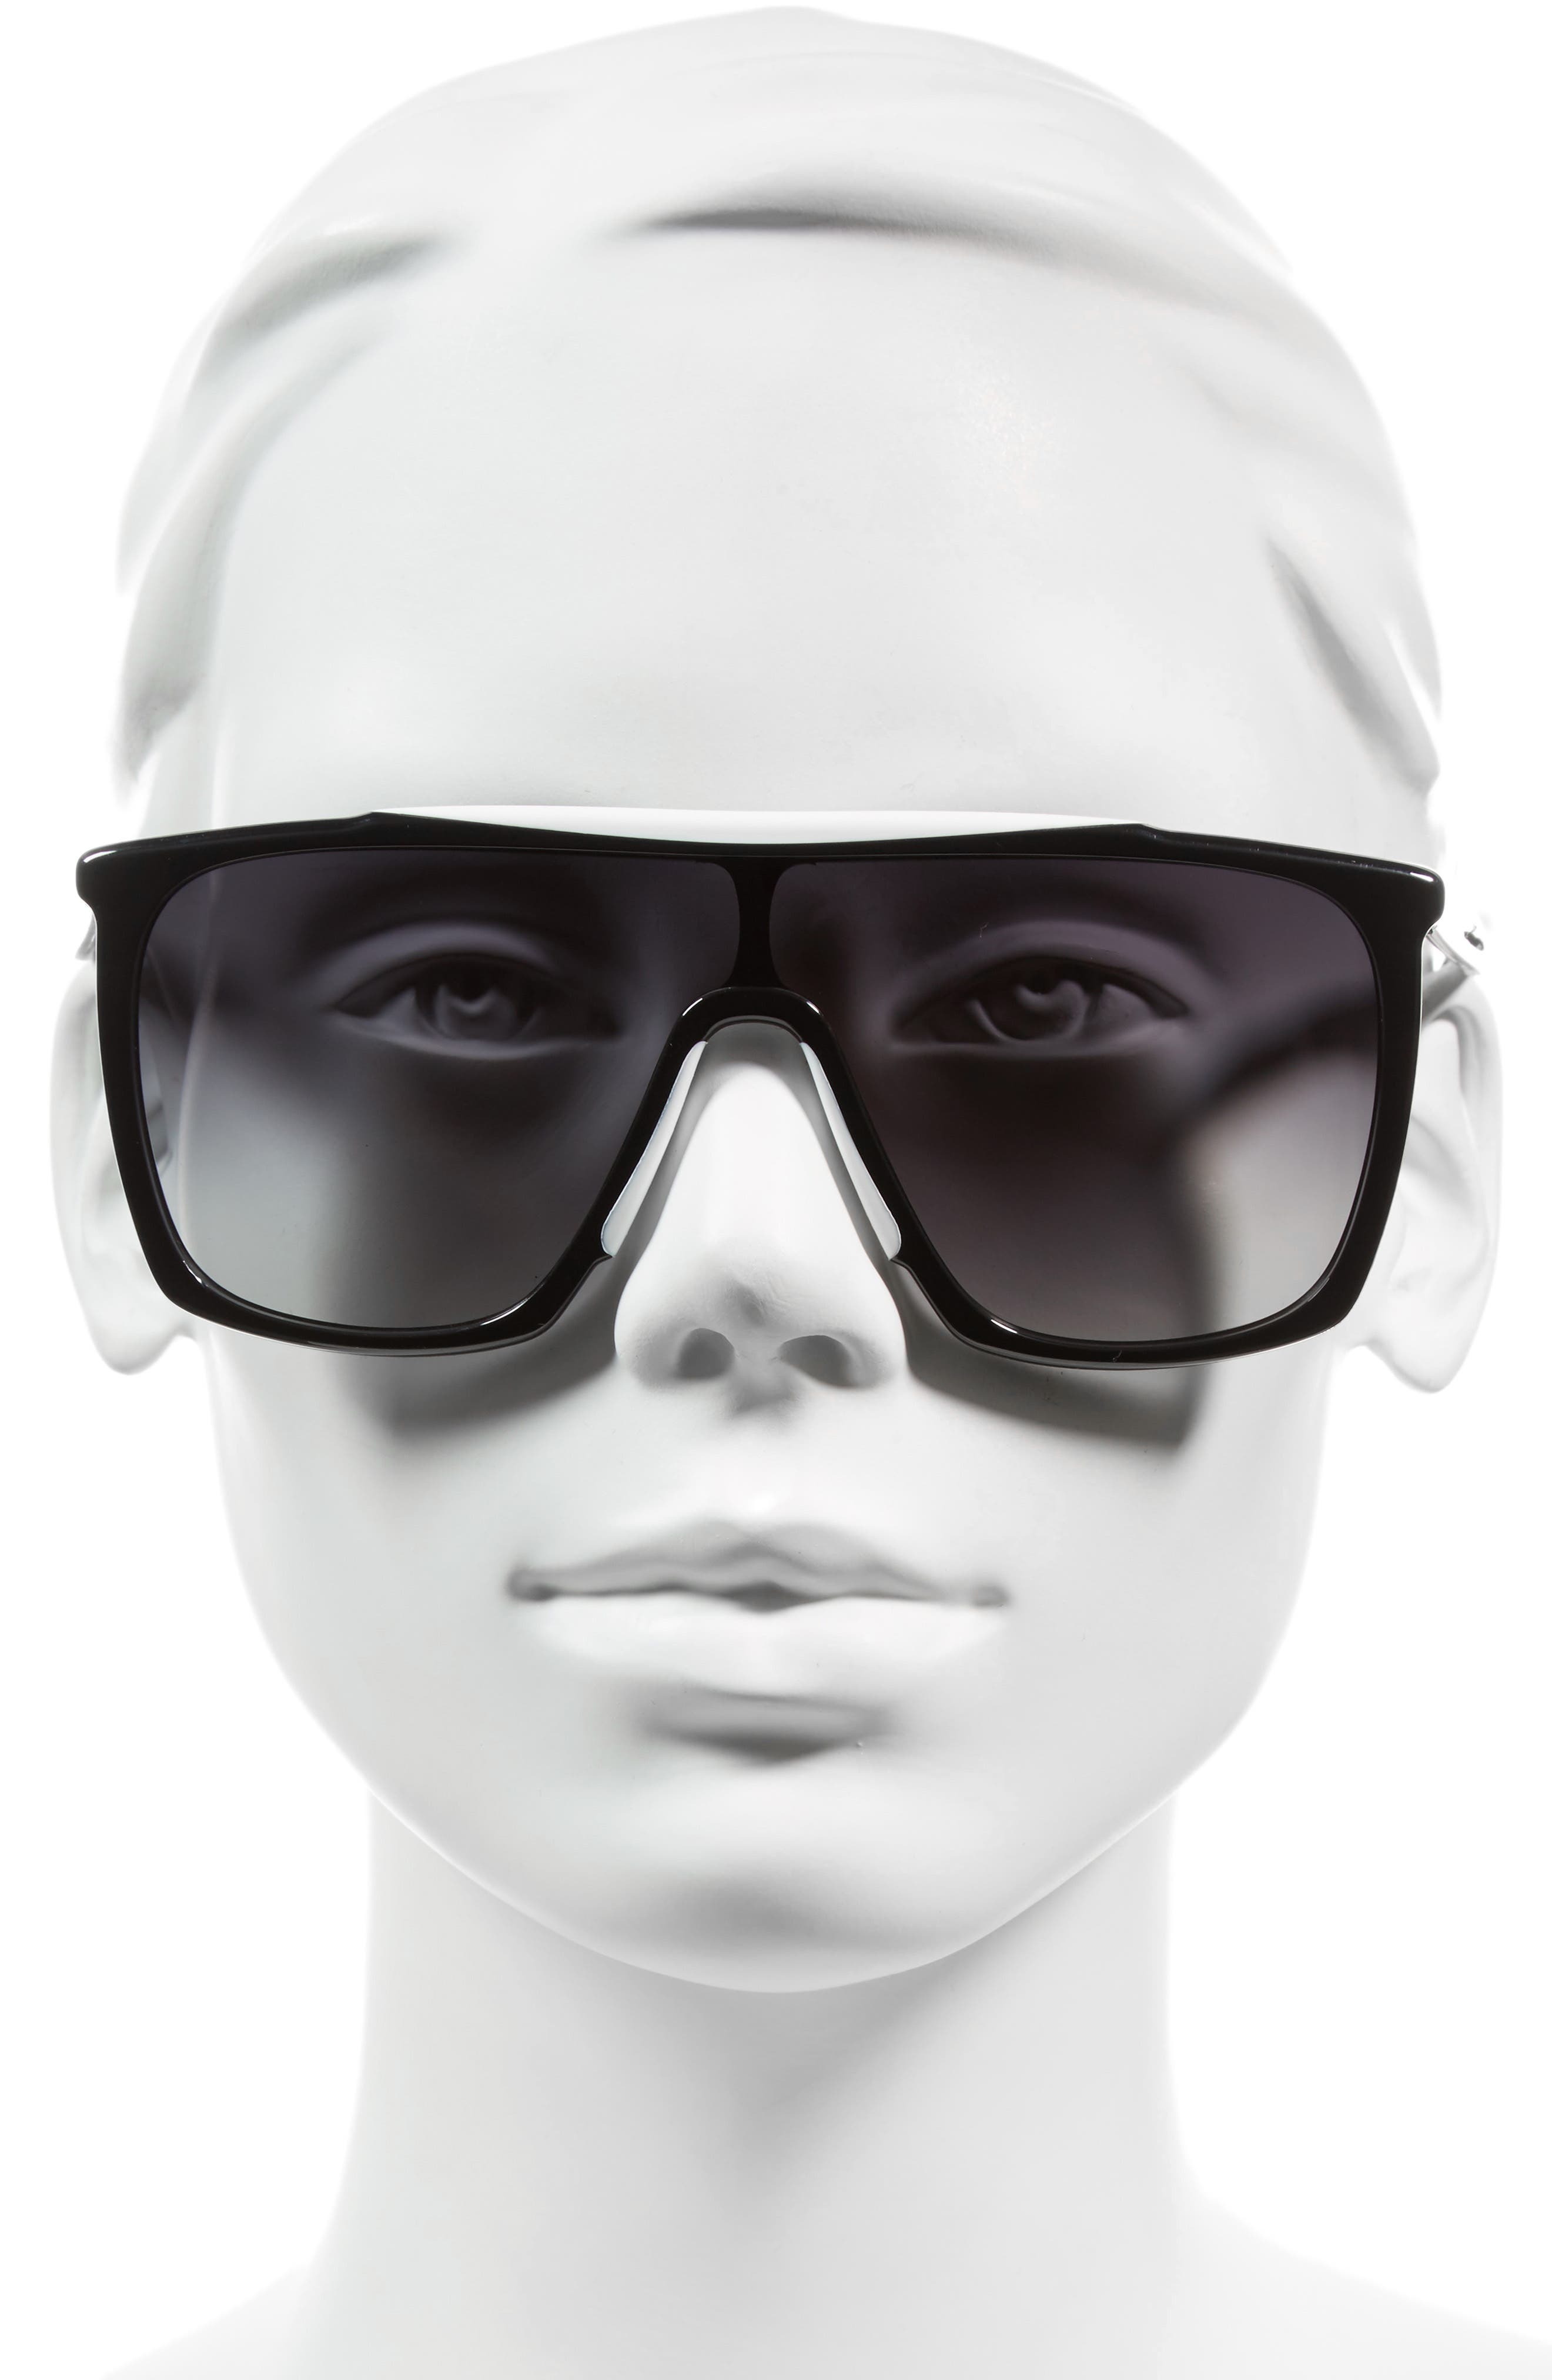 53mm Mask Sunglasses,                             Alternate thumbnail 2, color,                             Black/ White